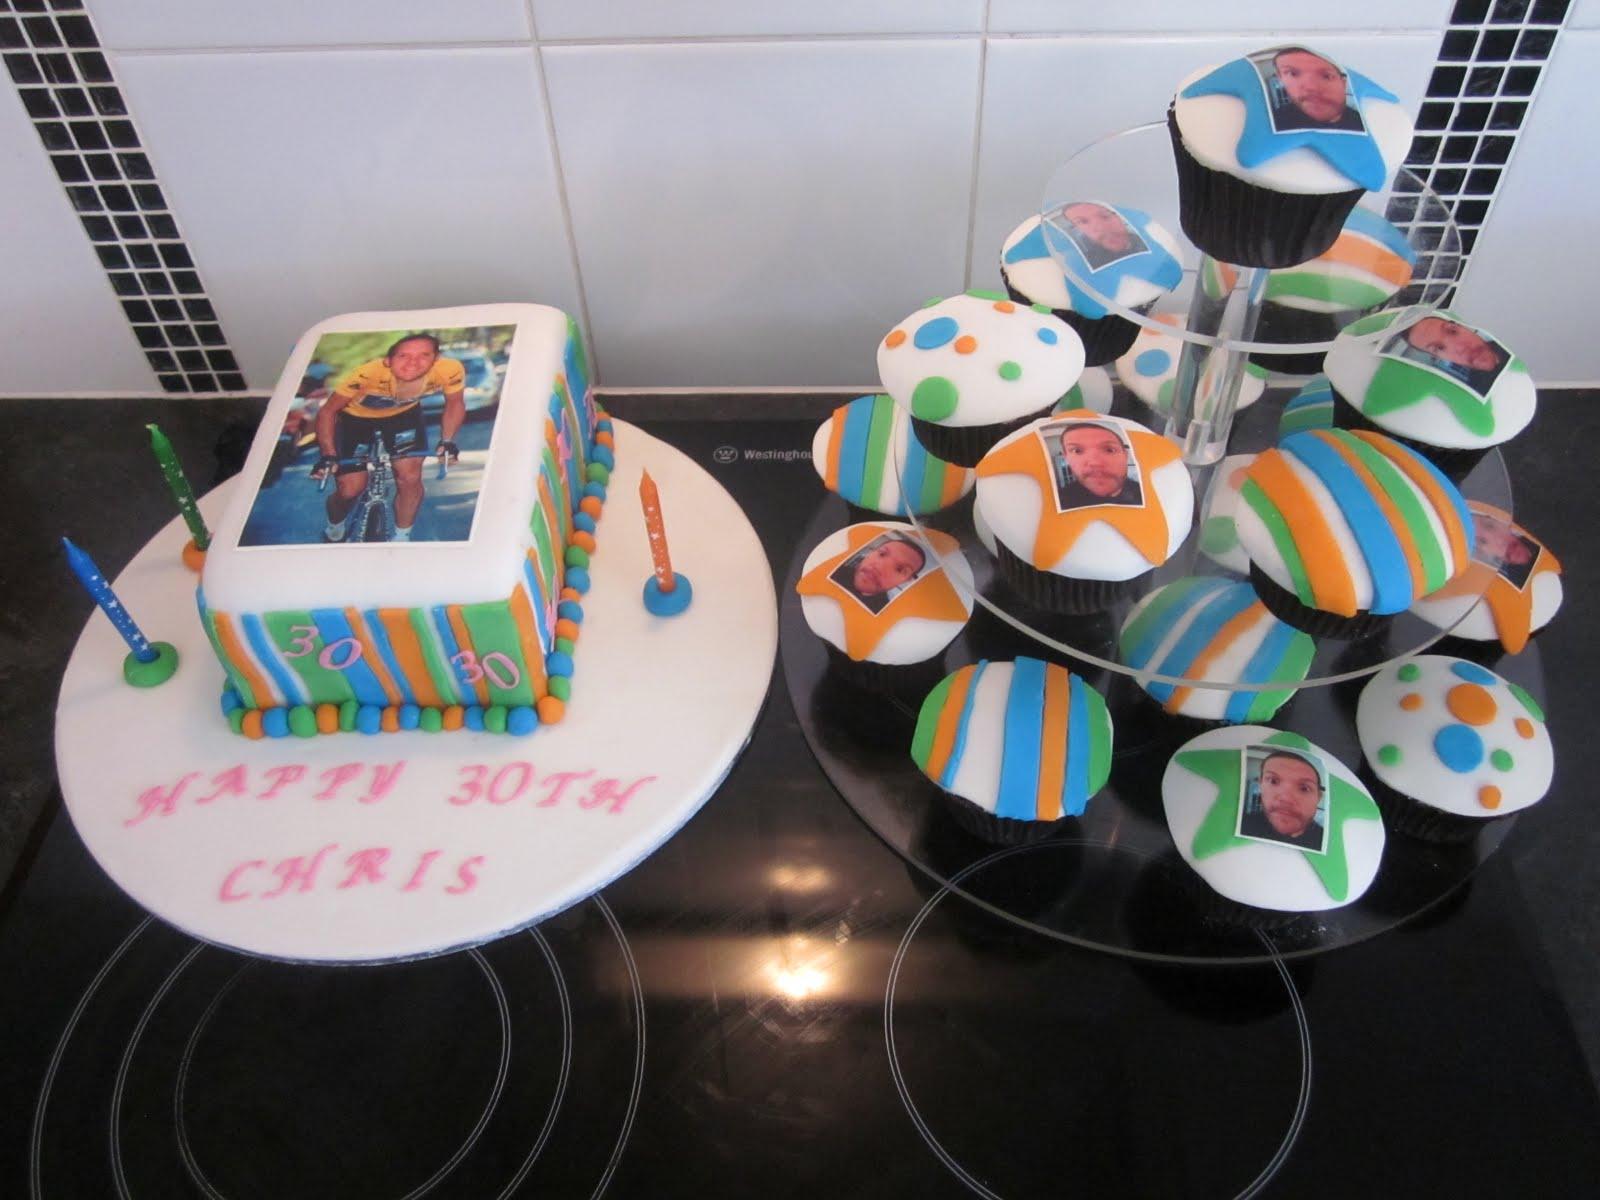 30th Birthday Party Bad Taste Themed Cake